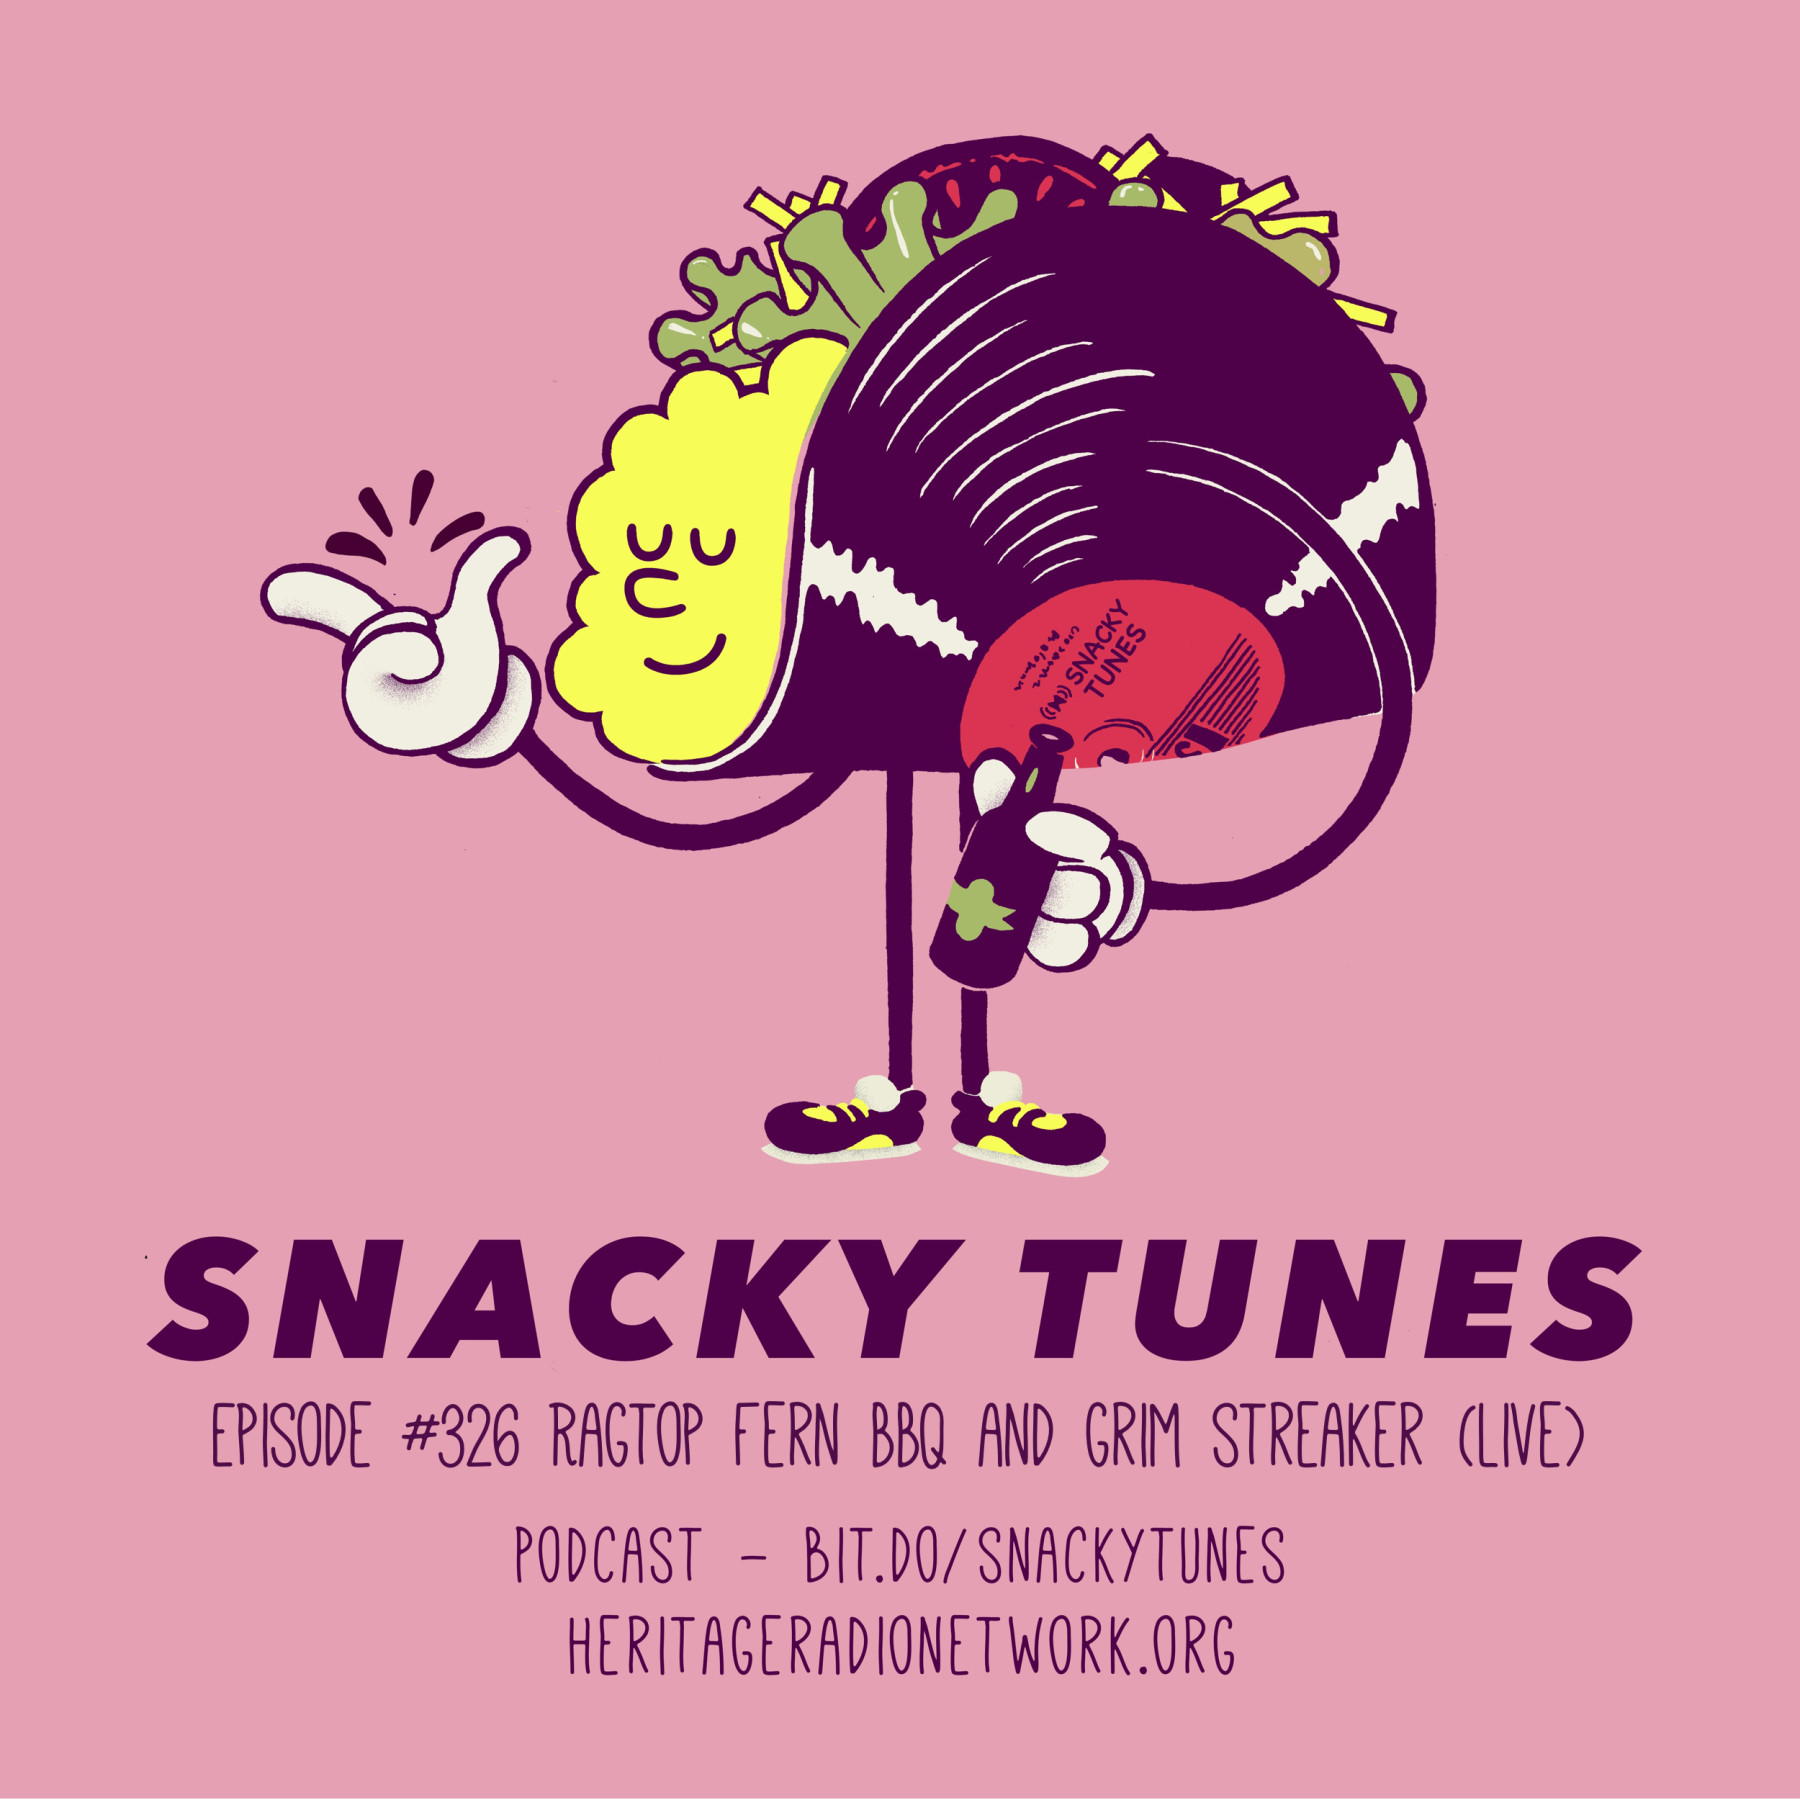 Snacky_Tunes-Podacst_Editable_326.001 (1)